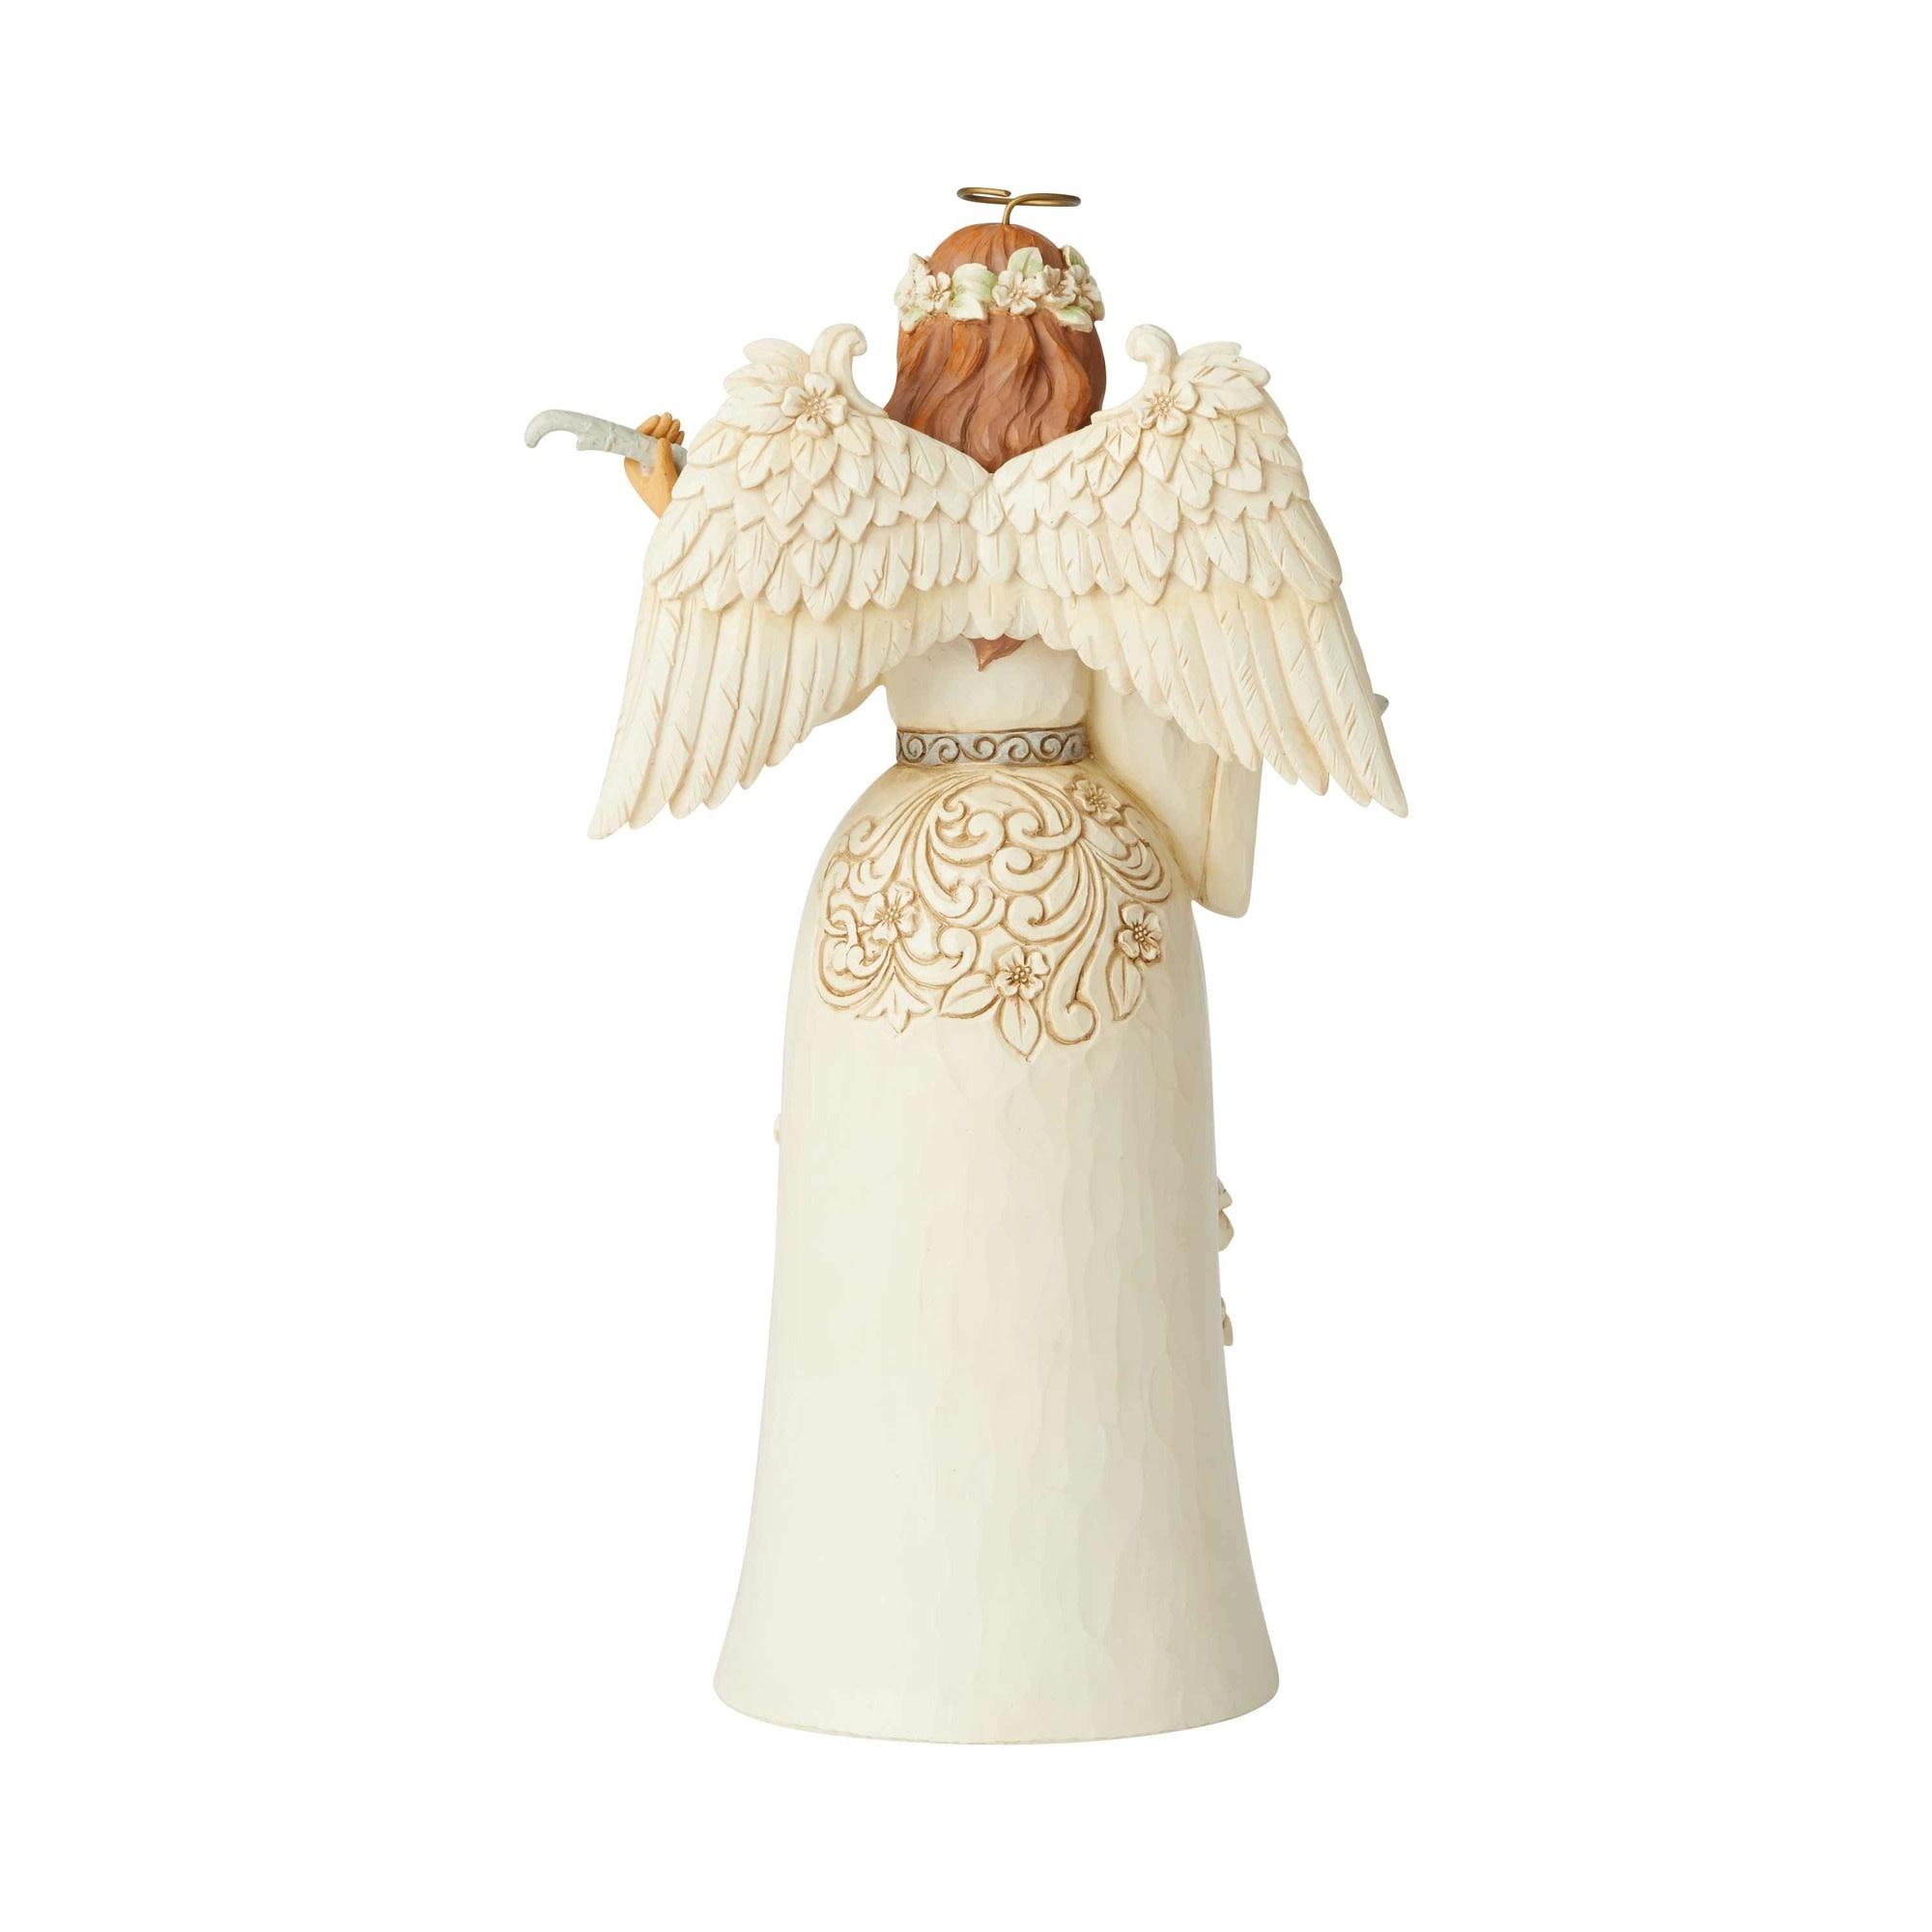 Jim Shore White Woodland Nativity Angel